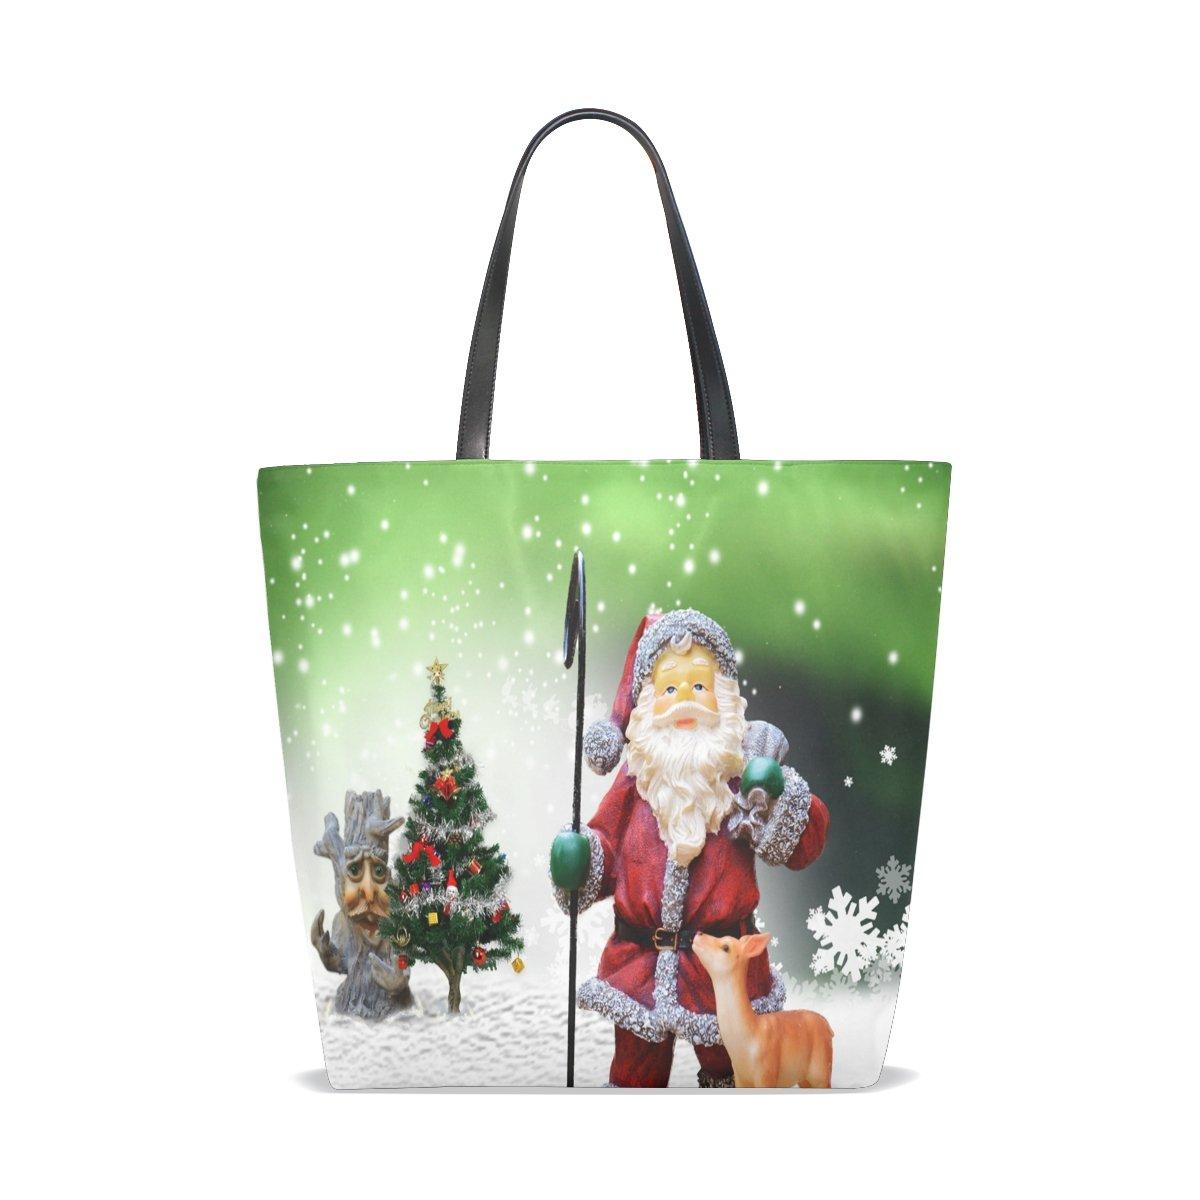 AHOMY Christmas Santa Claus Tree Snowflake Elk Lady Personalized casual Shoulder Bag Satchel Handbag Tote Bag Handbag for Women Girls